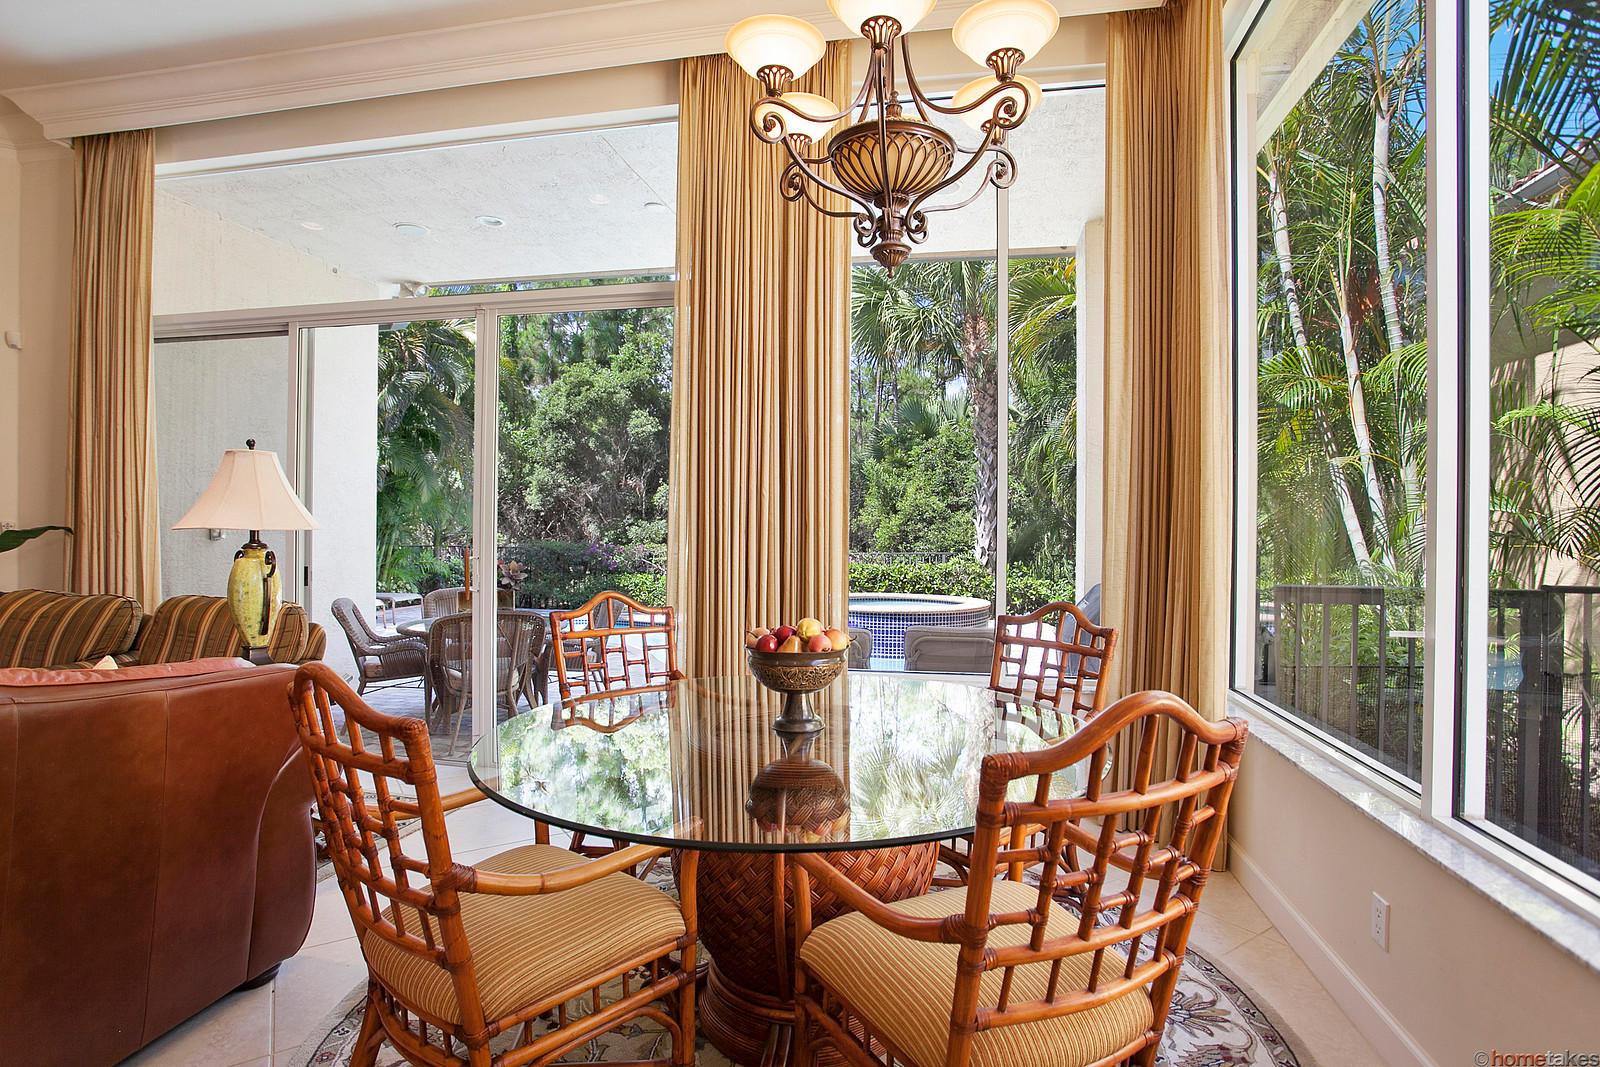 206 Porto Vecchio Way, Palm Beach Gardens, Florida 33418, 3 Bedrooms Bedrooms, ,3.1 BathroomsBathrooms,F,Single family,Porto Vecchio,RX-10676715